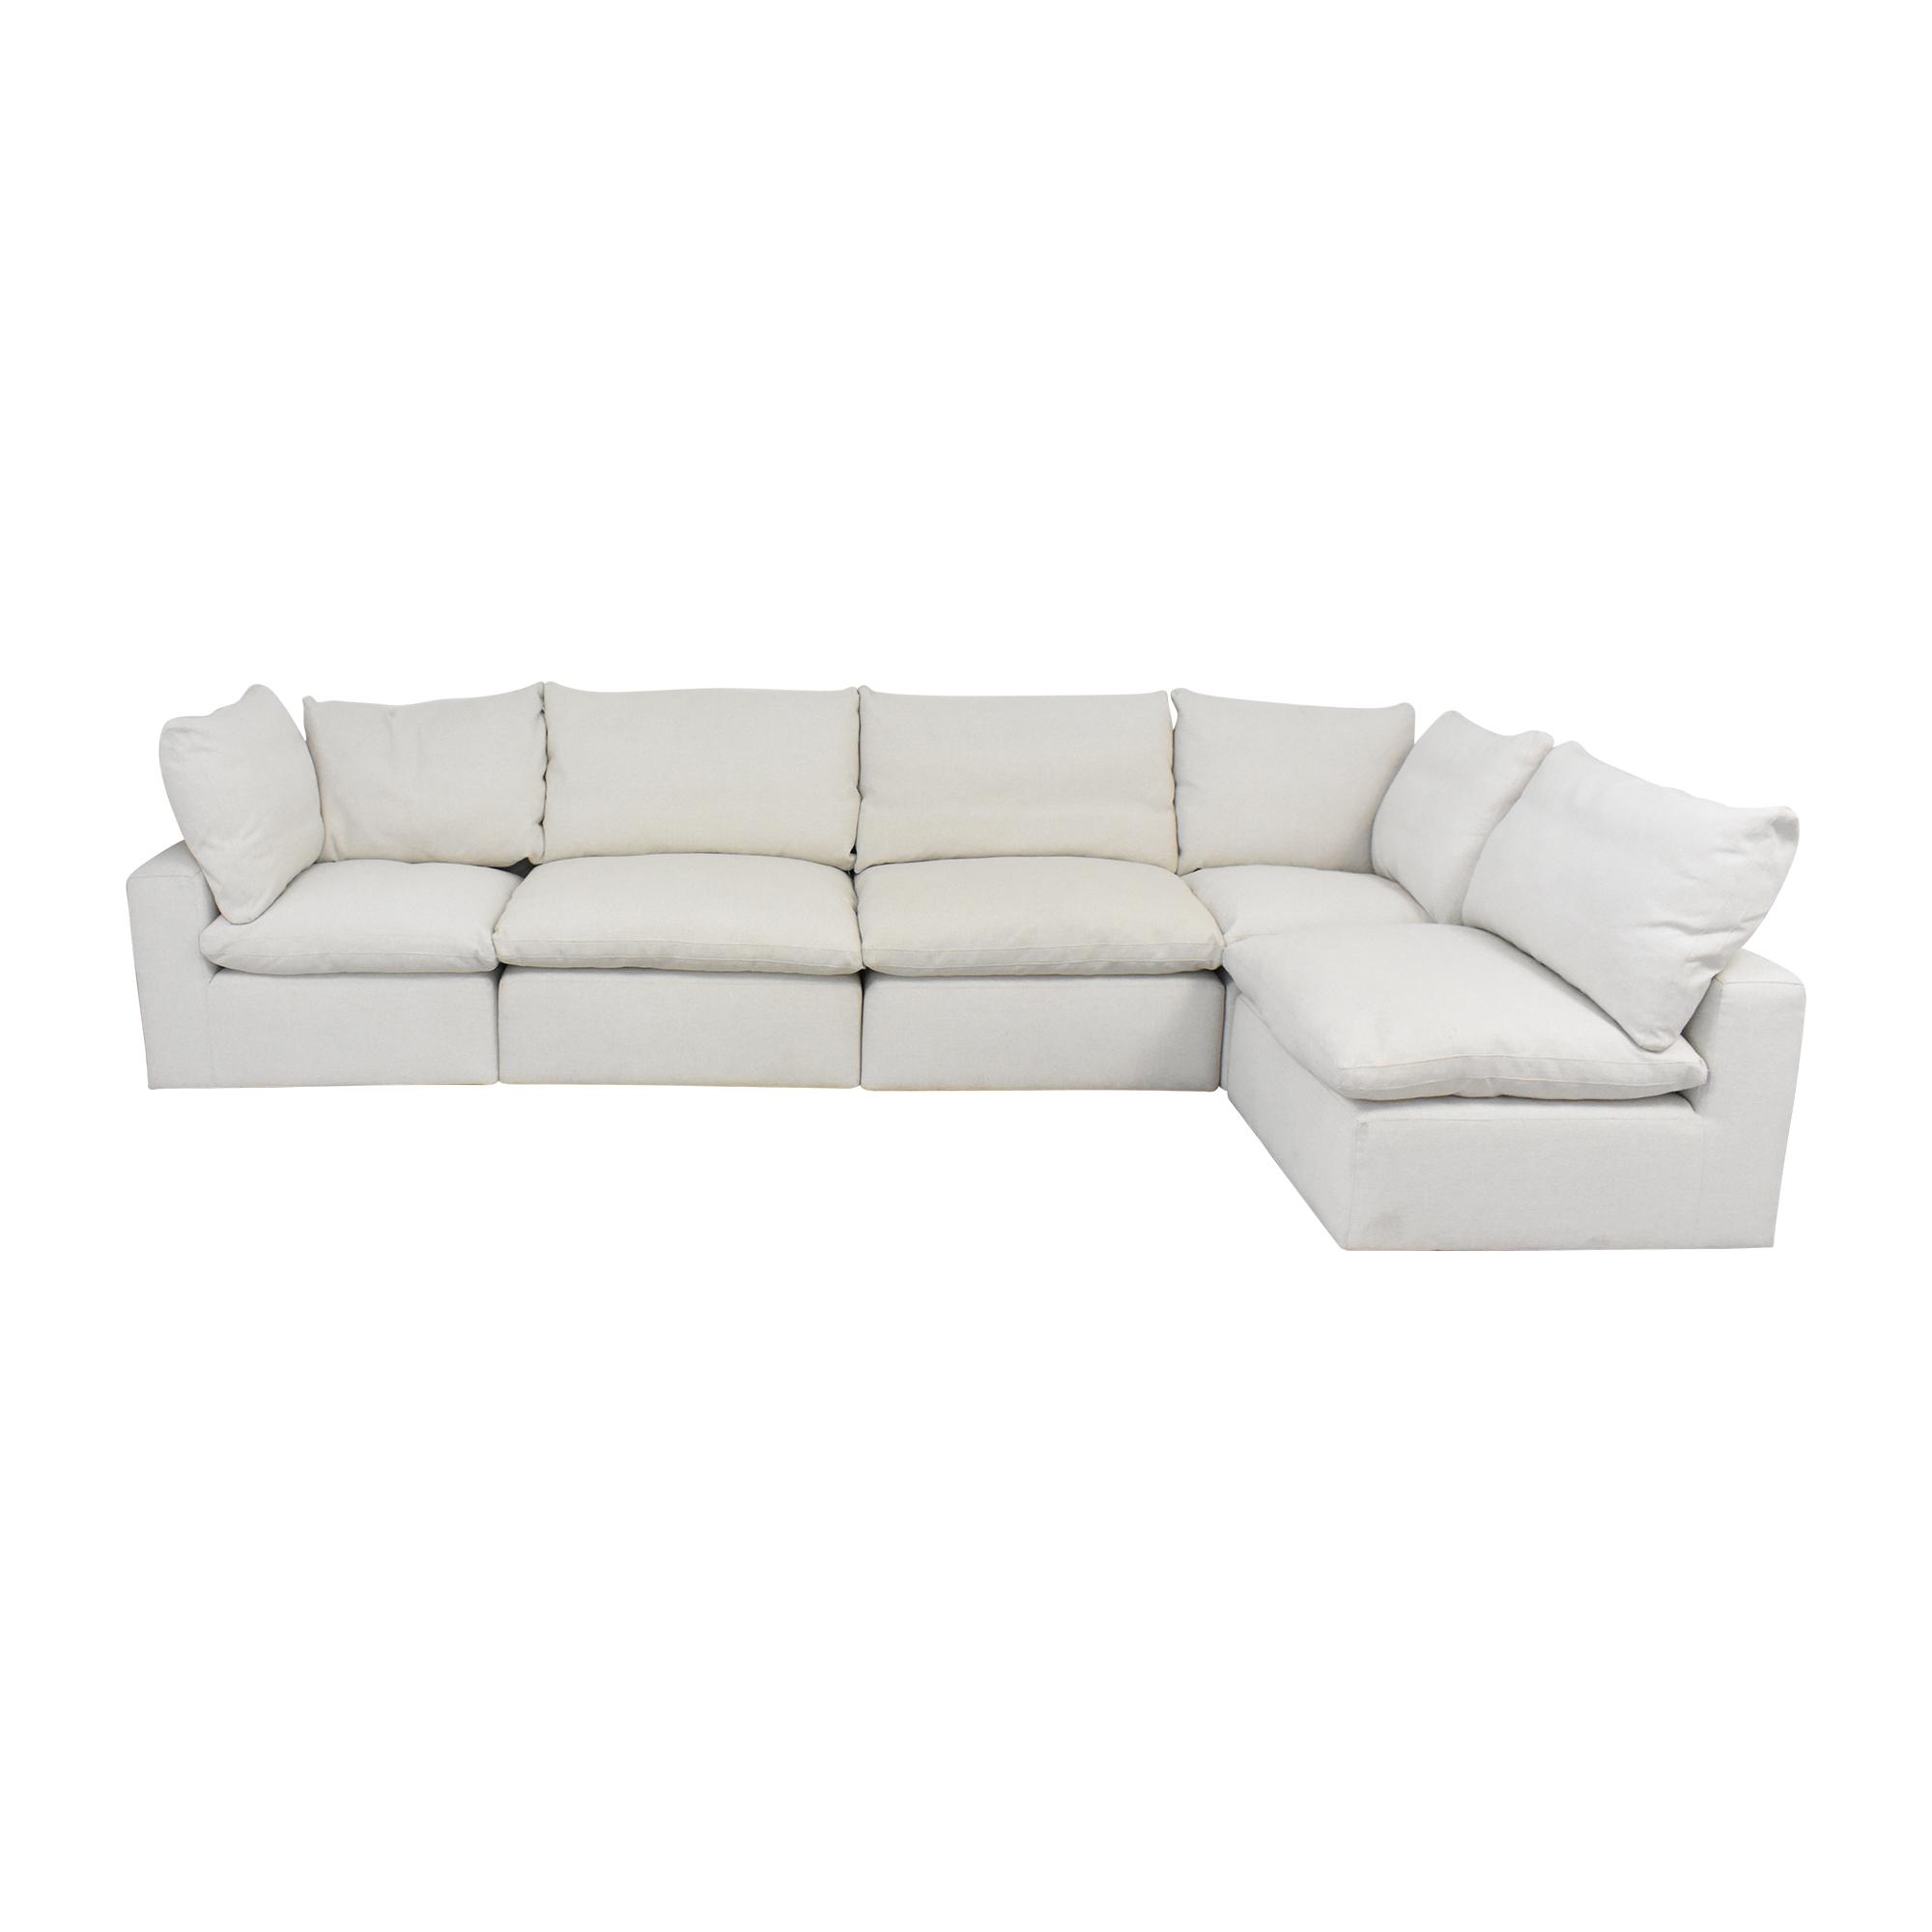 Bassett Furniture Bassett Furniture Corner Modular Sofa coupon